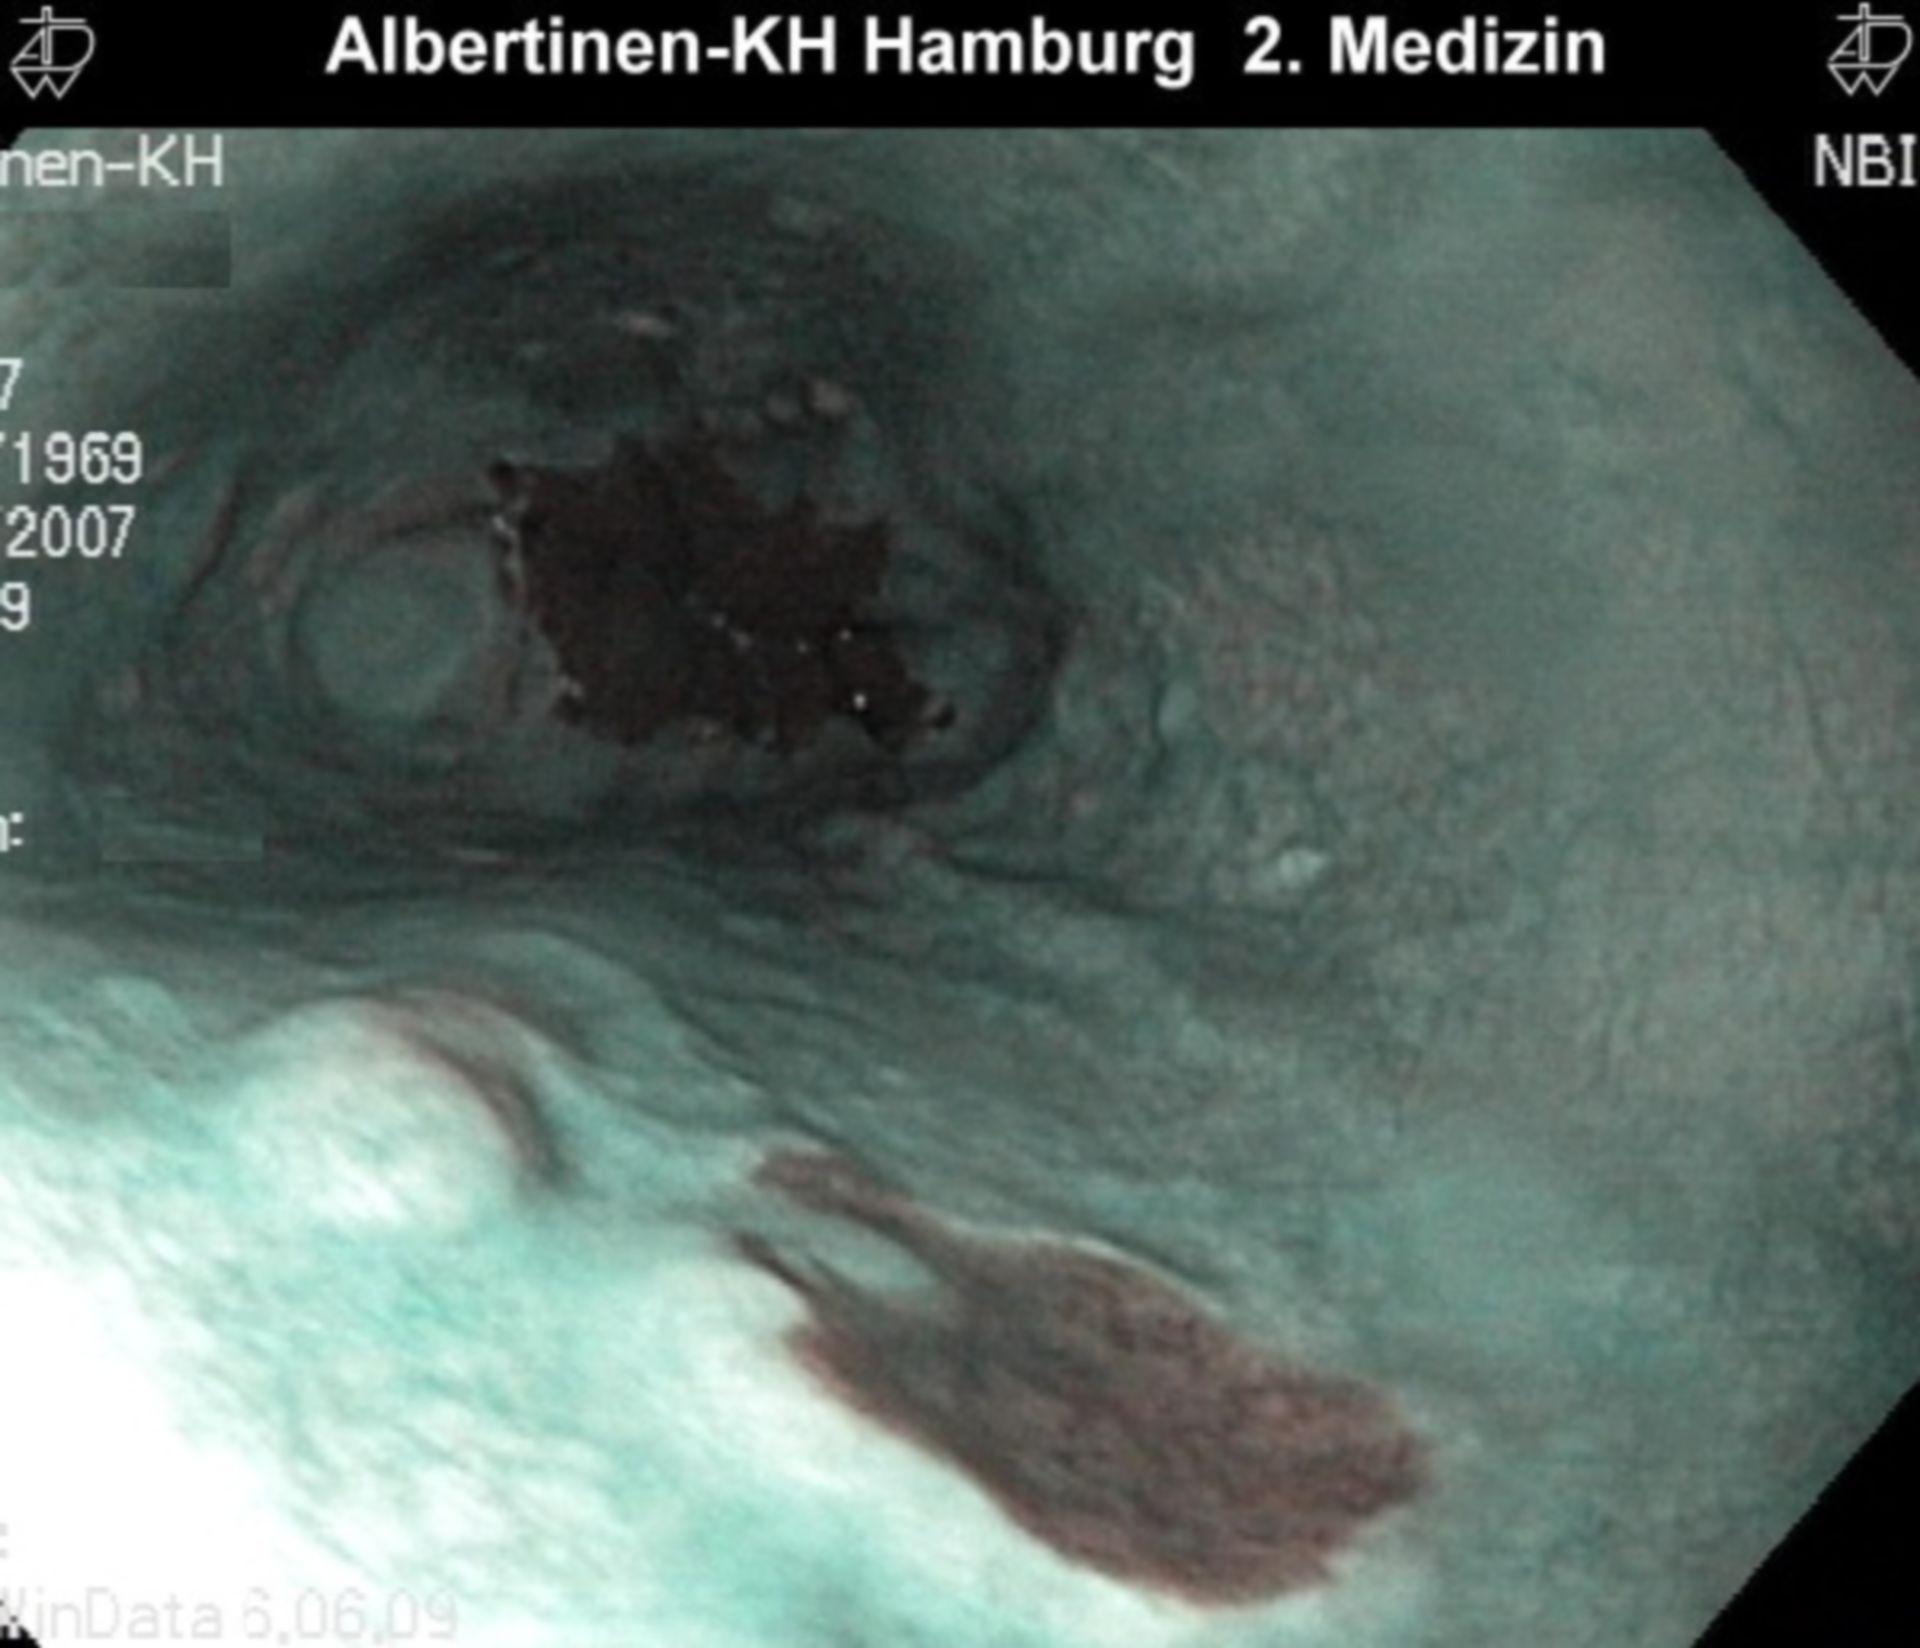 Metaplasia with NBI (narrow band imaging)